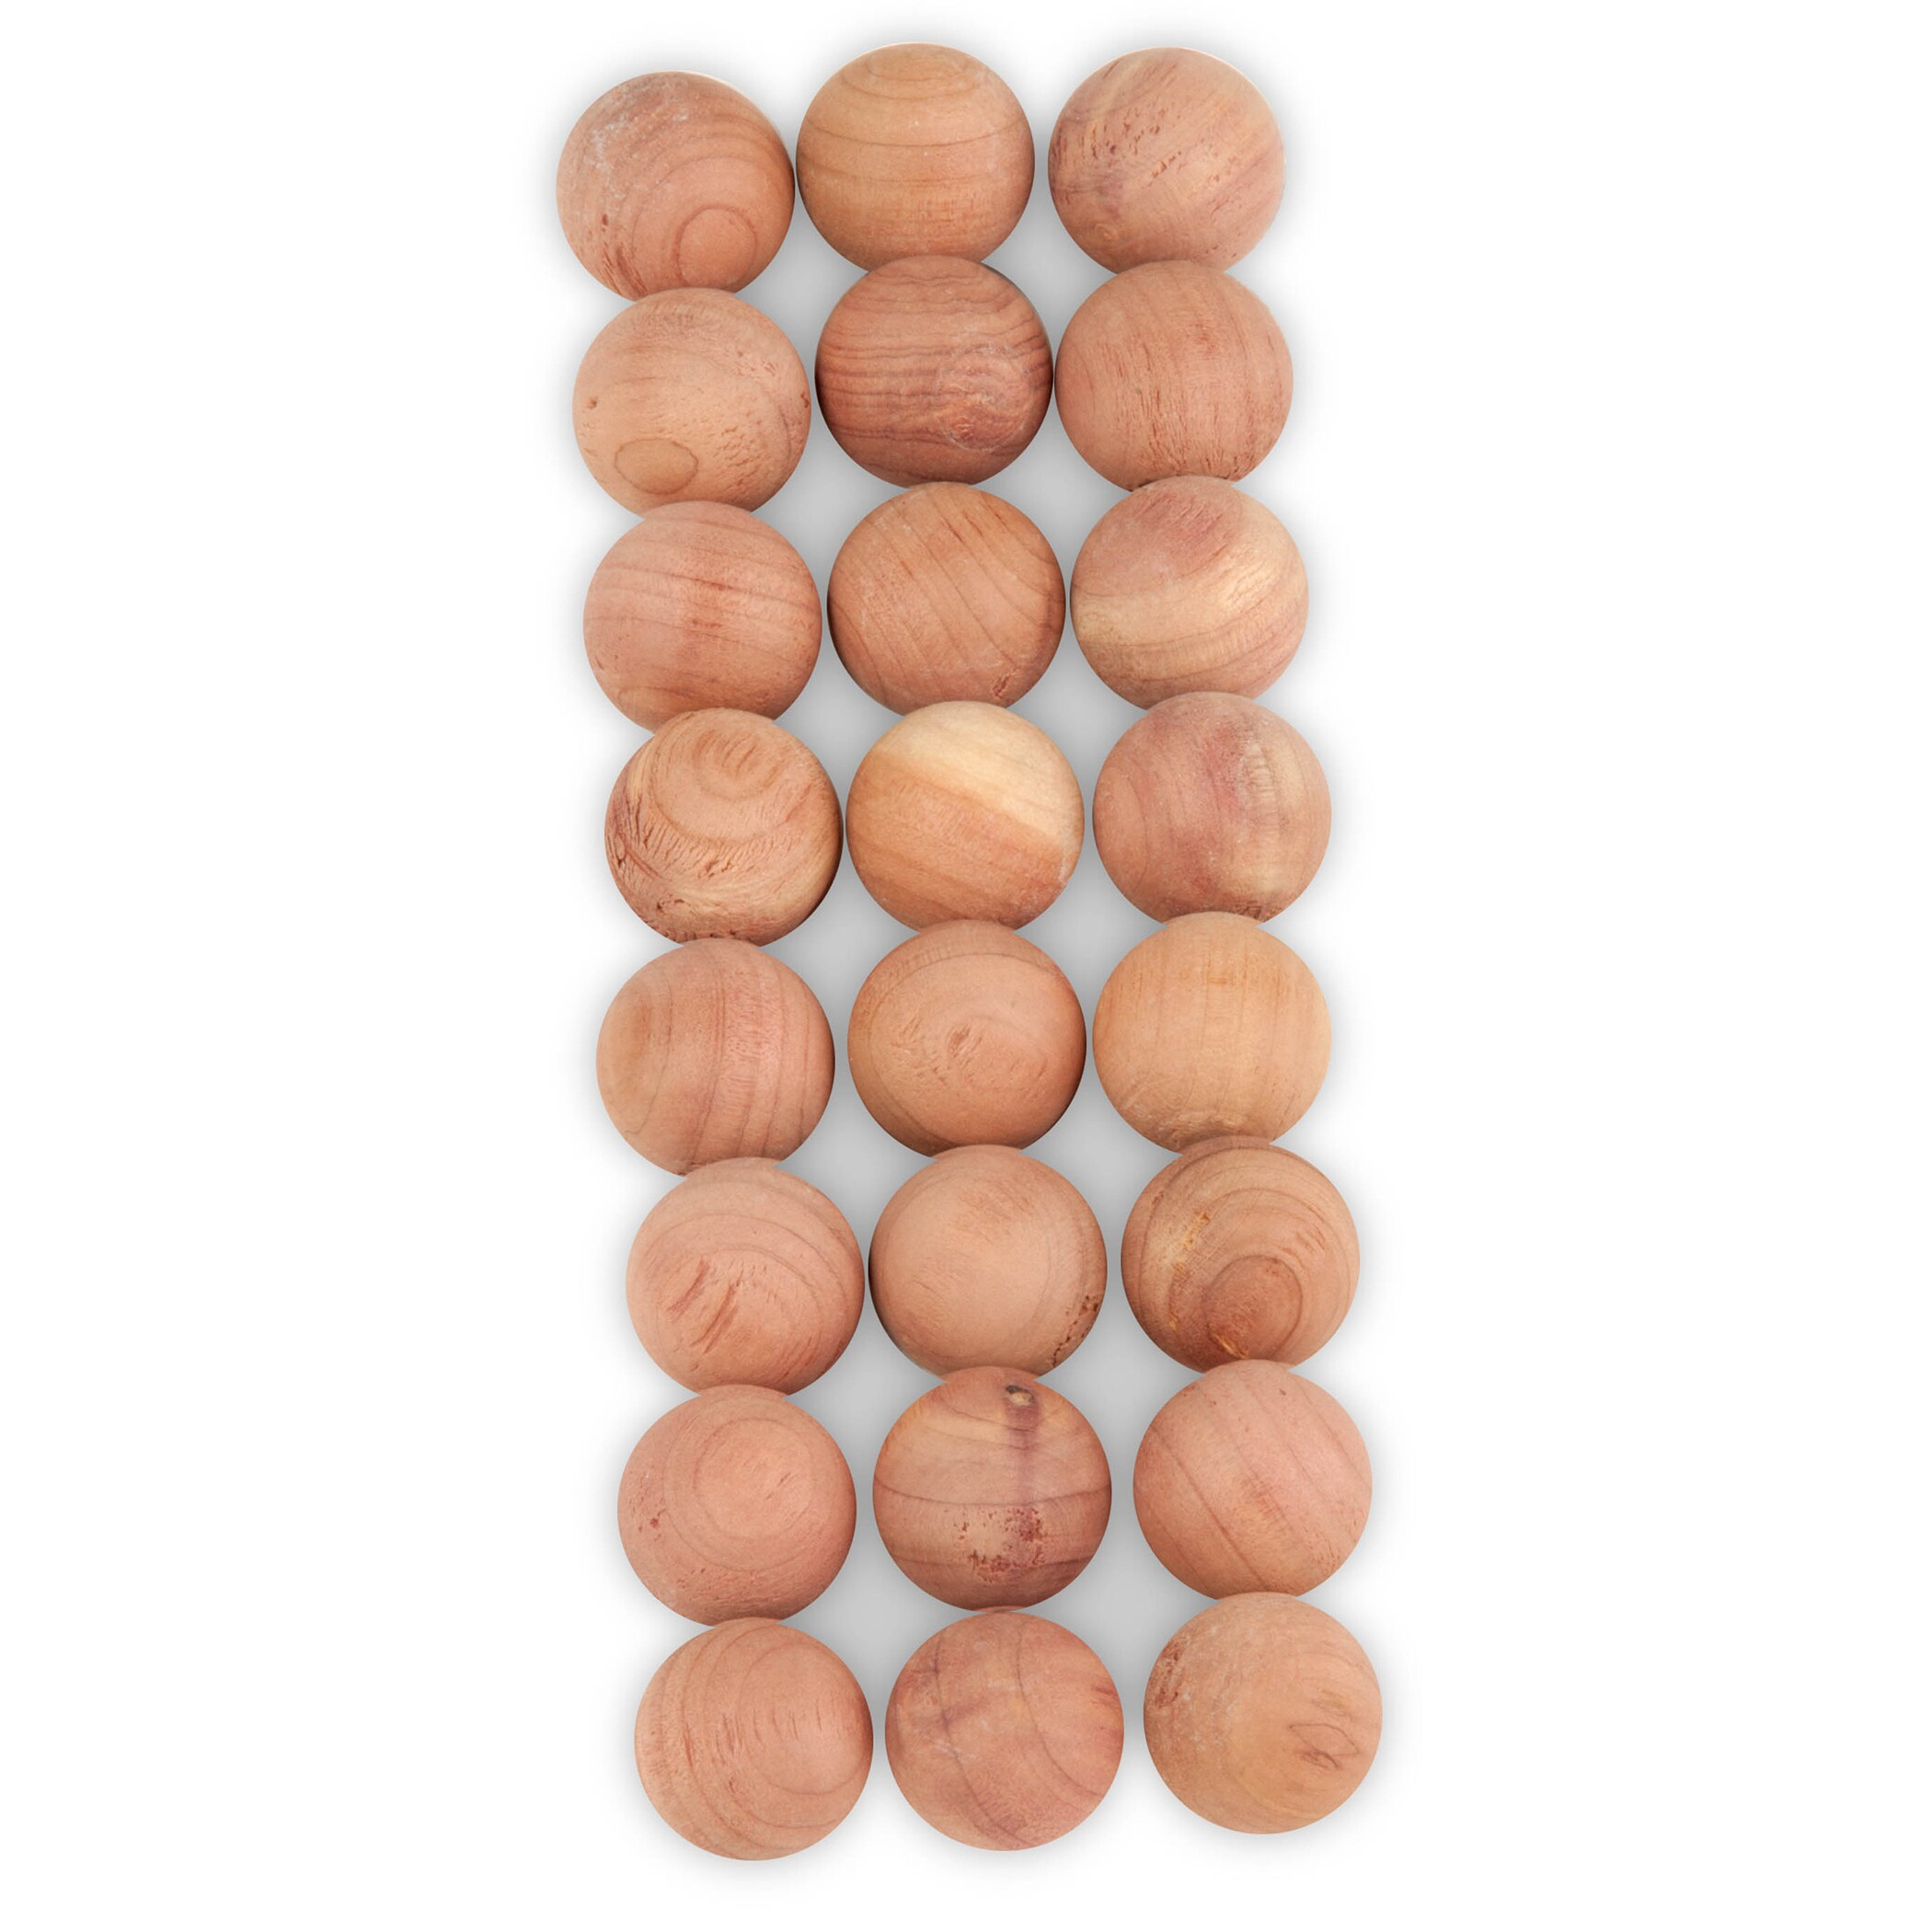 Honey-Can-Do HNG-01969 Natural Red Cedar Balls 24-count (...